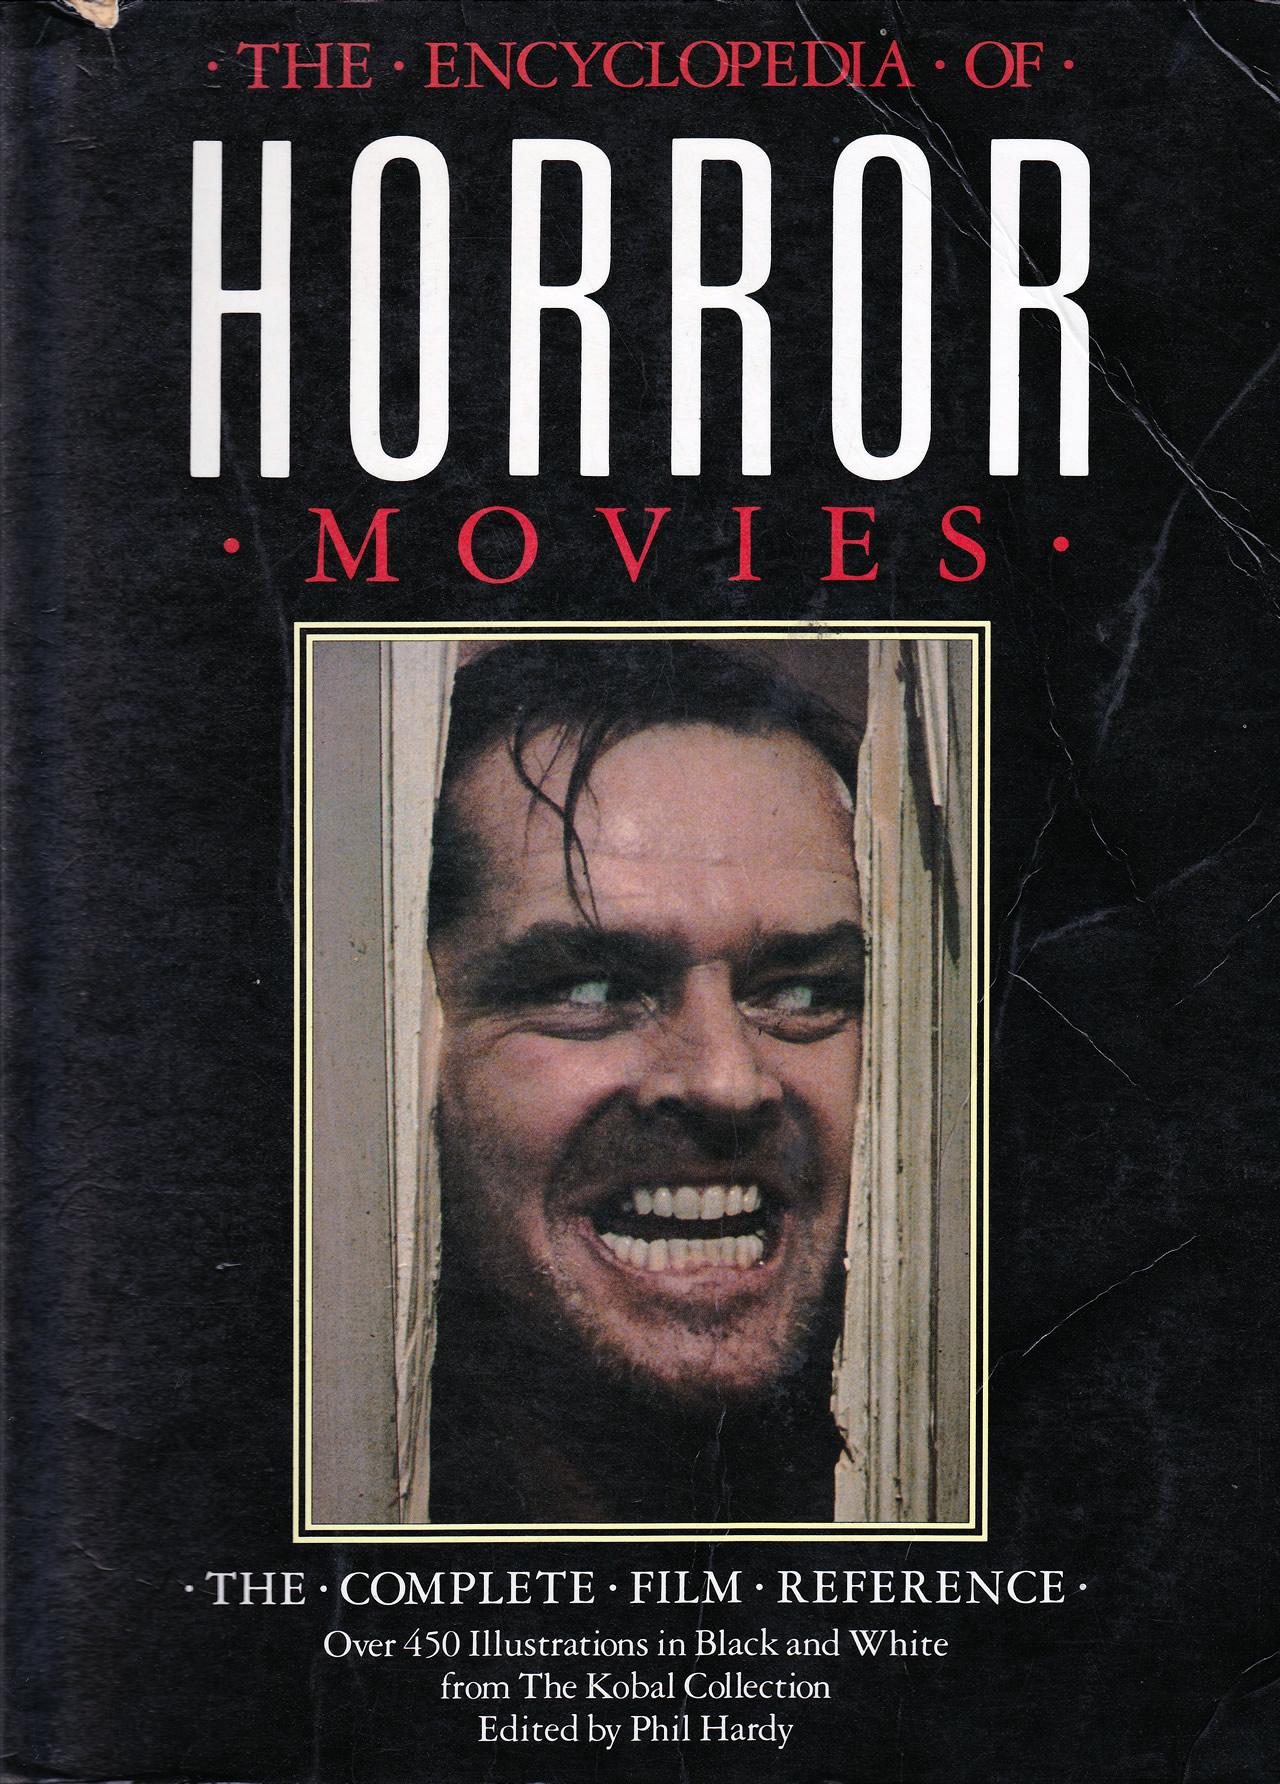 The Encyclopedia of Horror Movies (1987)